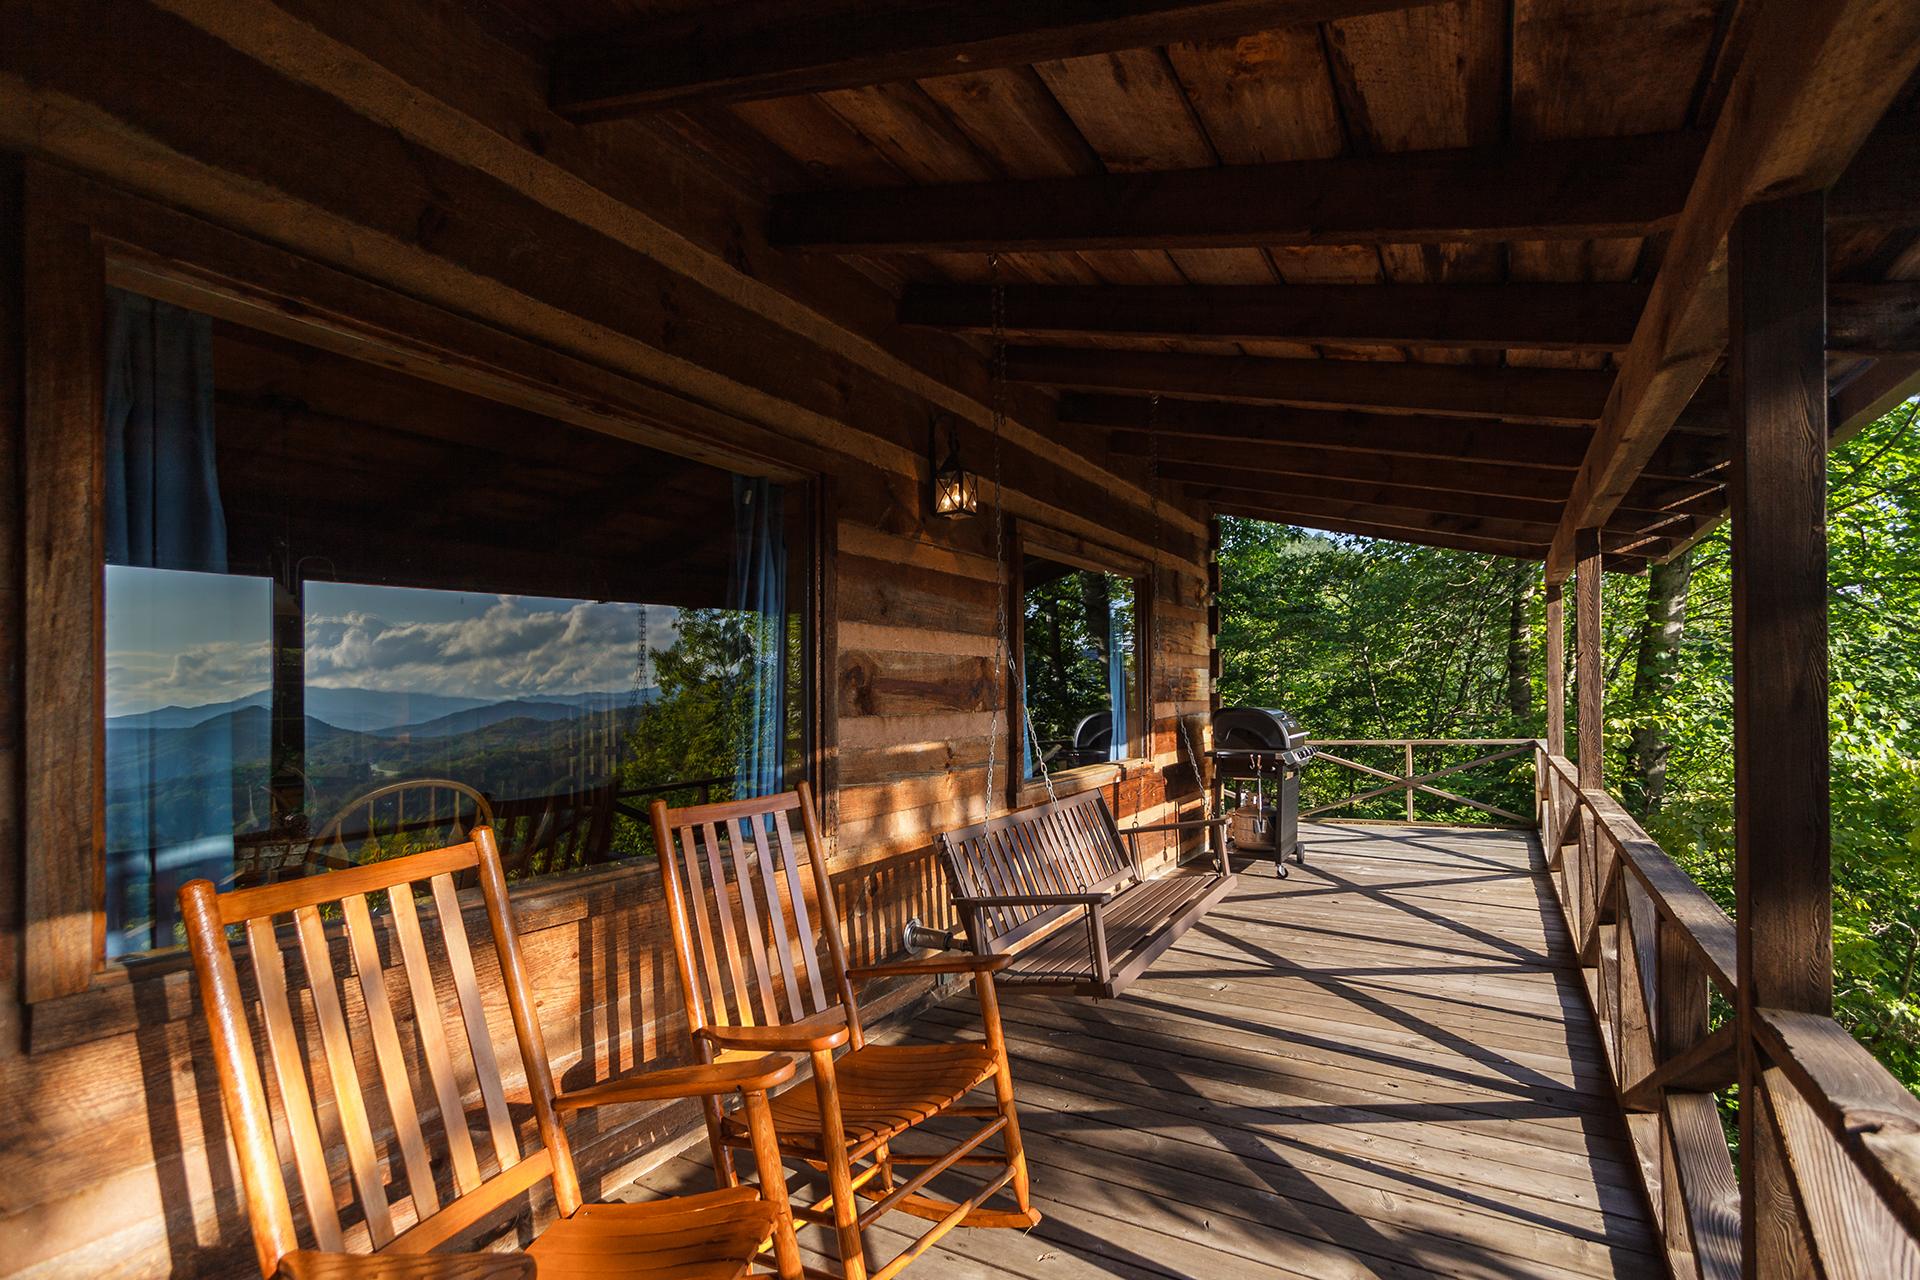 Grandpa 39 s smoky mountain log cabin vacation rental 1 bedroom - 1 bedroom cabins in smoky mountains ...